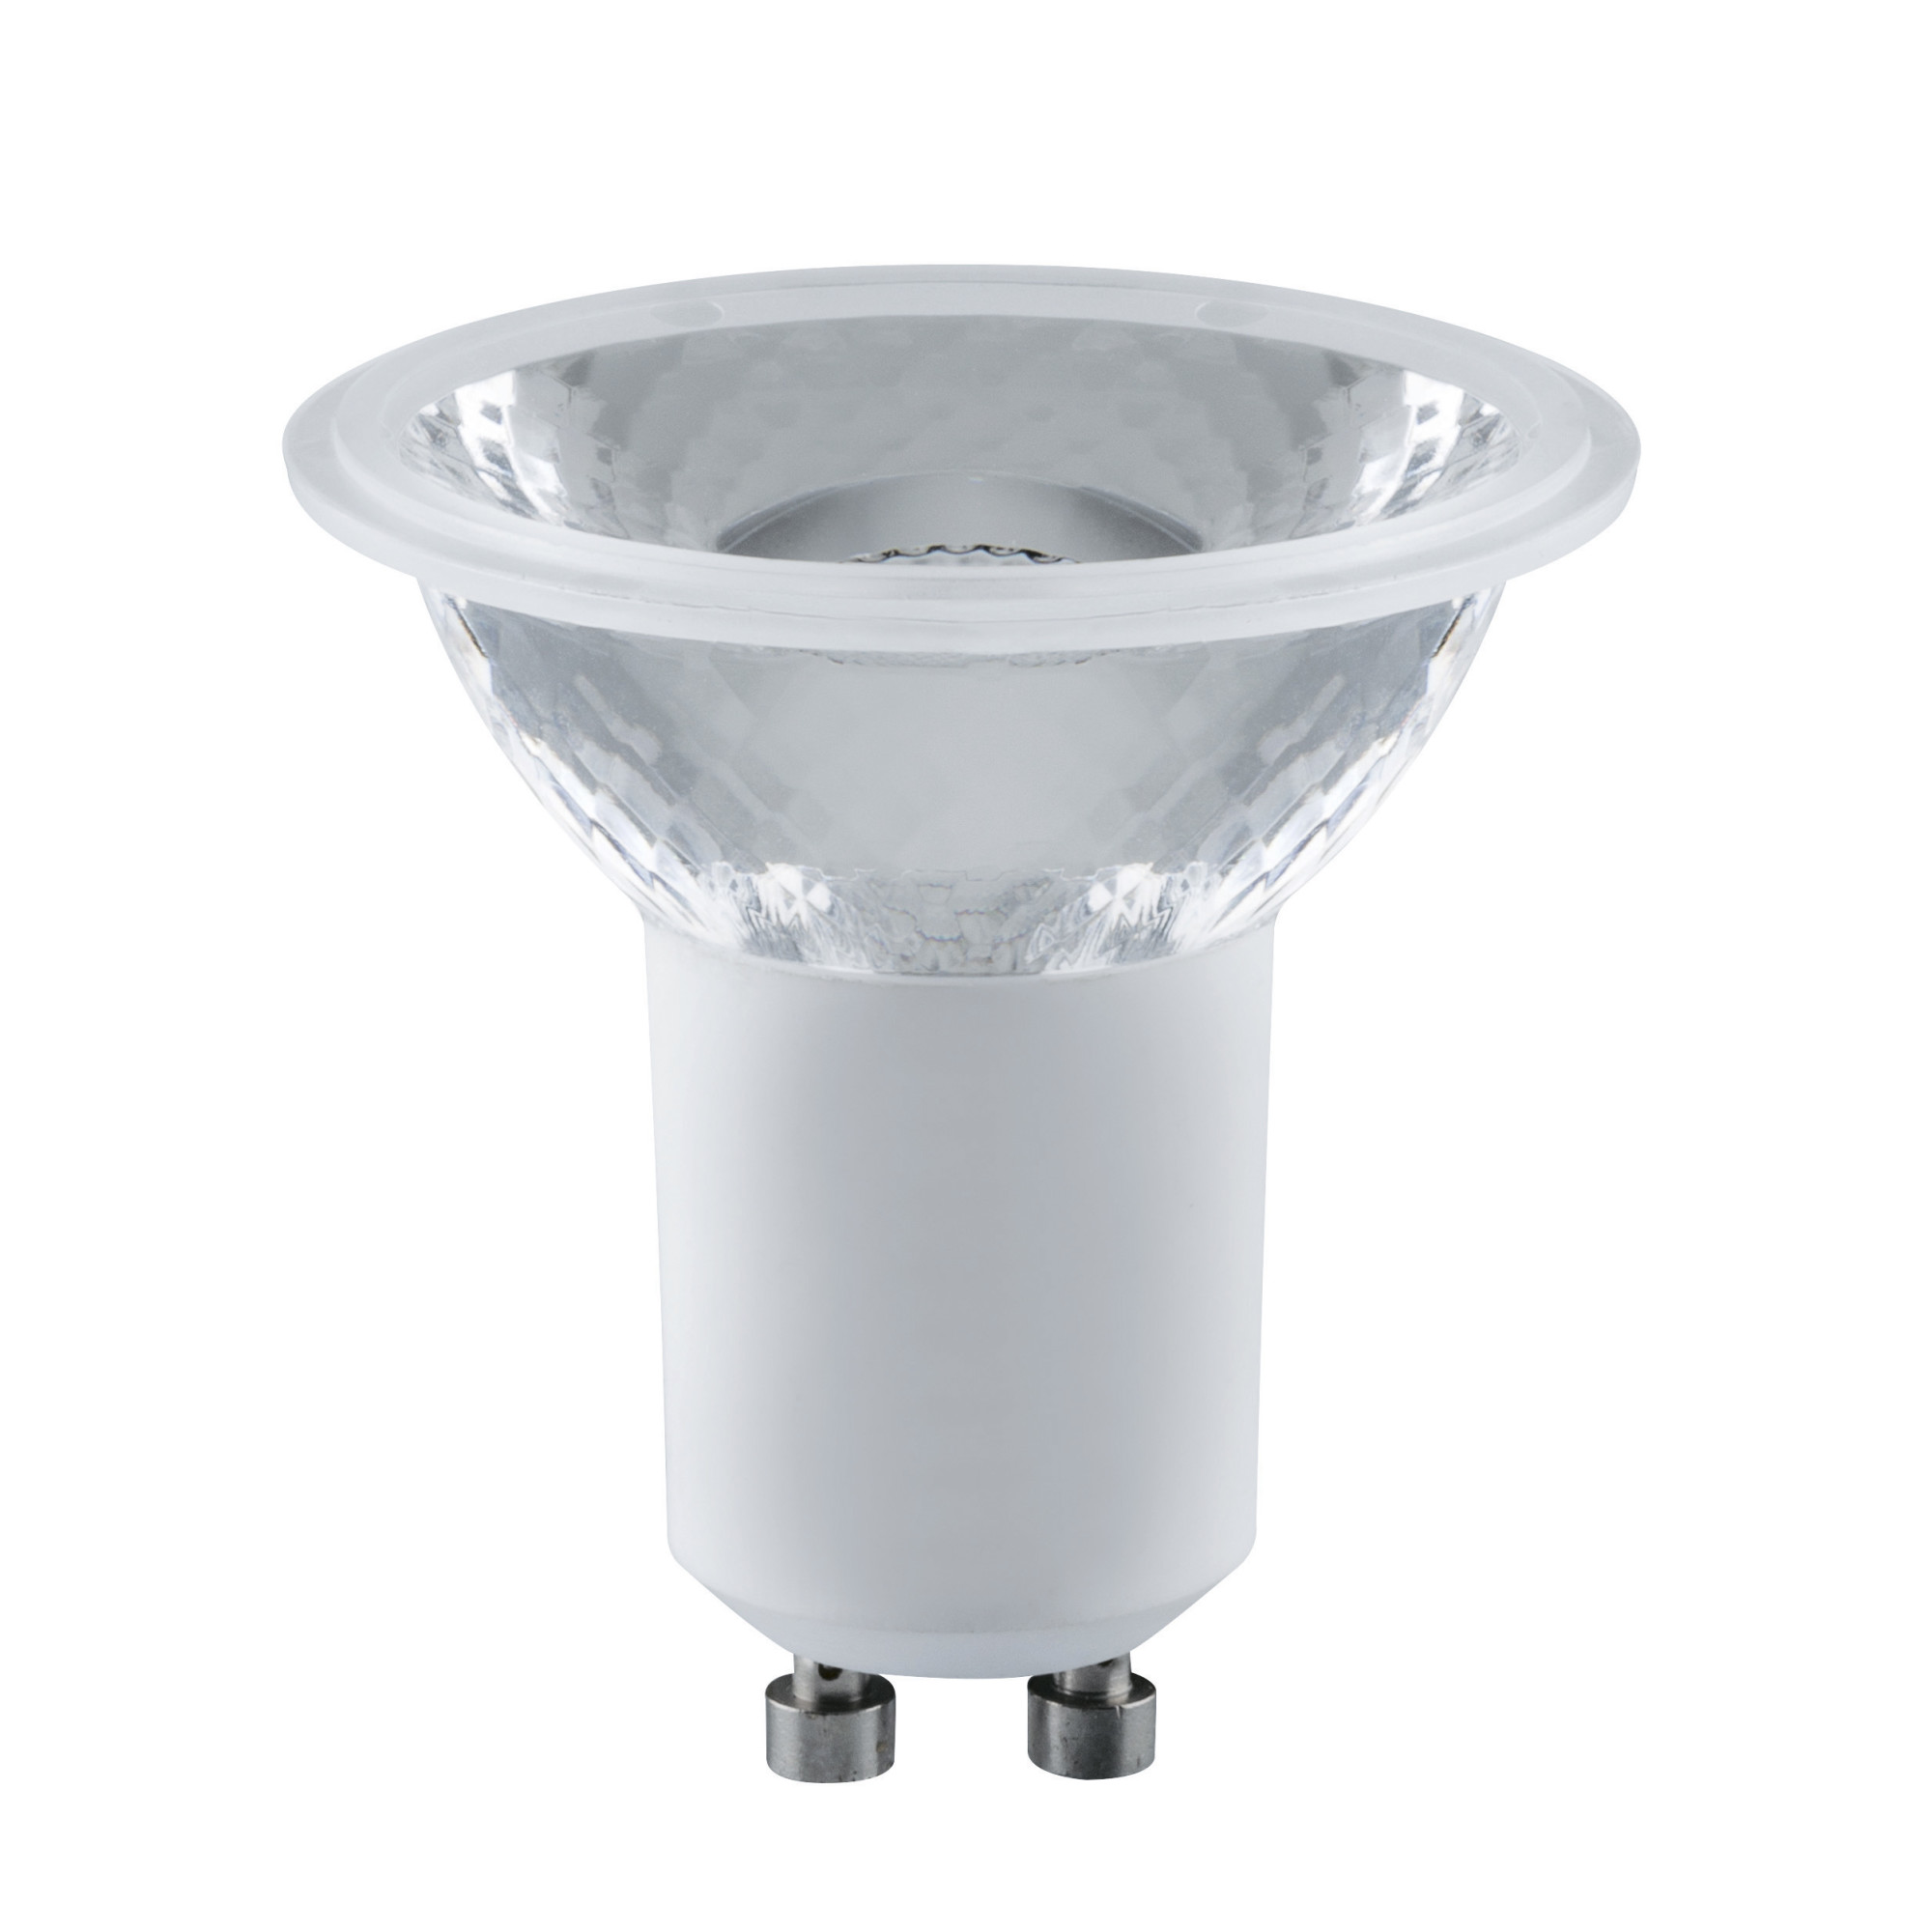 Лампа светодиодная Paulmann 28285 GU10 250 Лм теплый свет